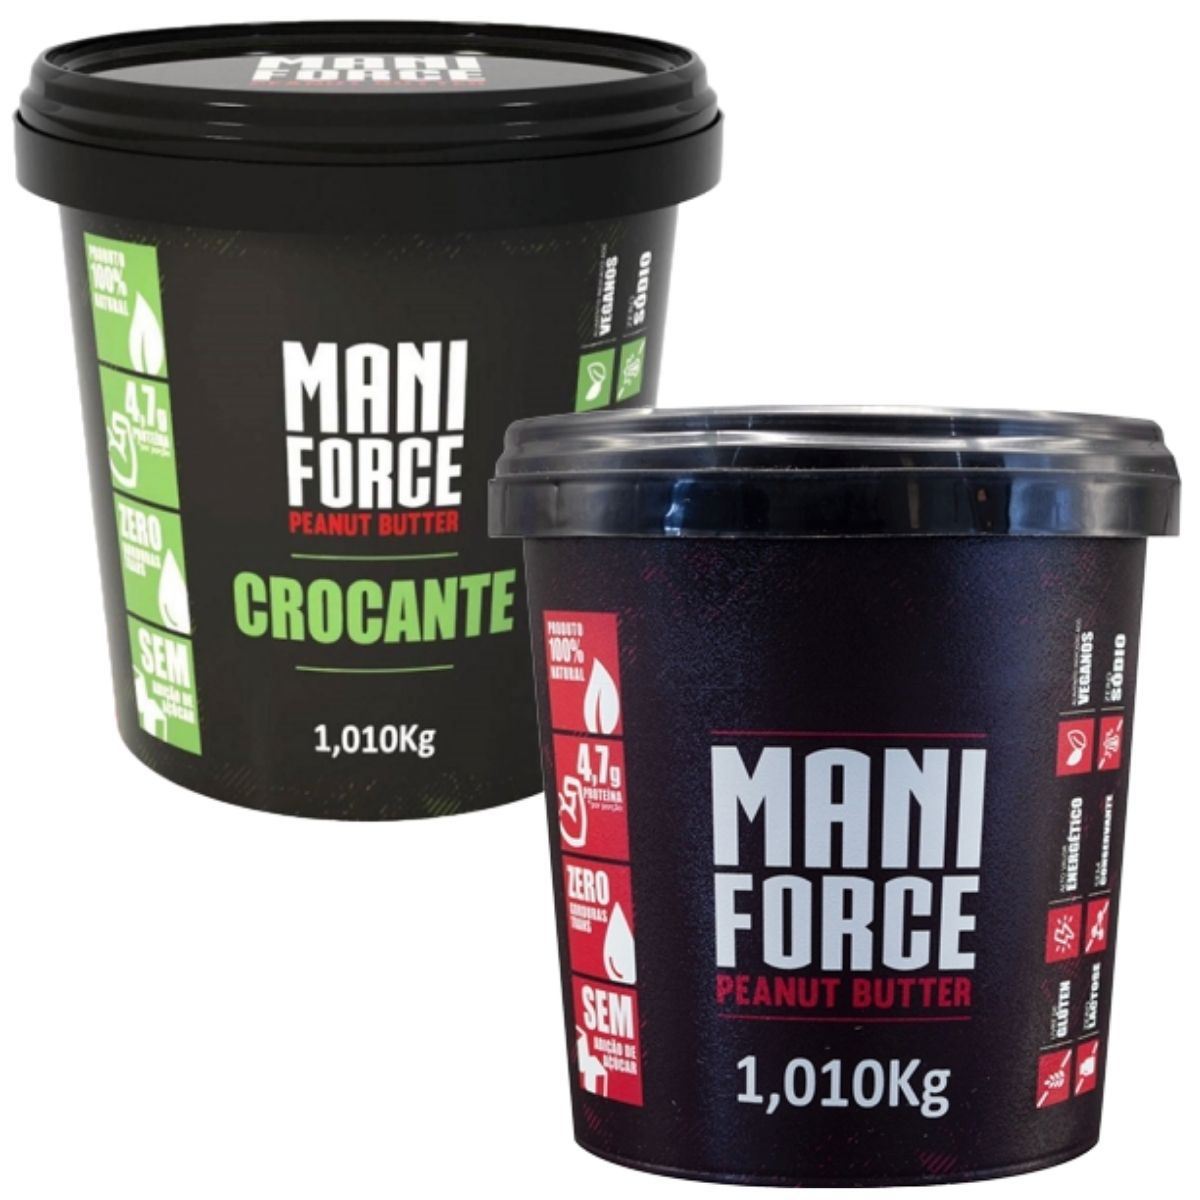 Pasta De Amendoim Maniforce 1kg - Manibi